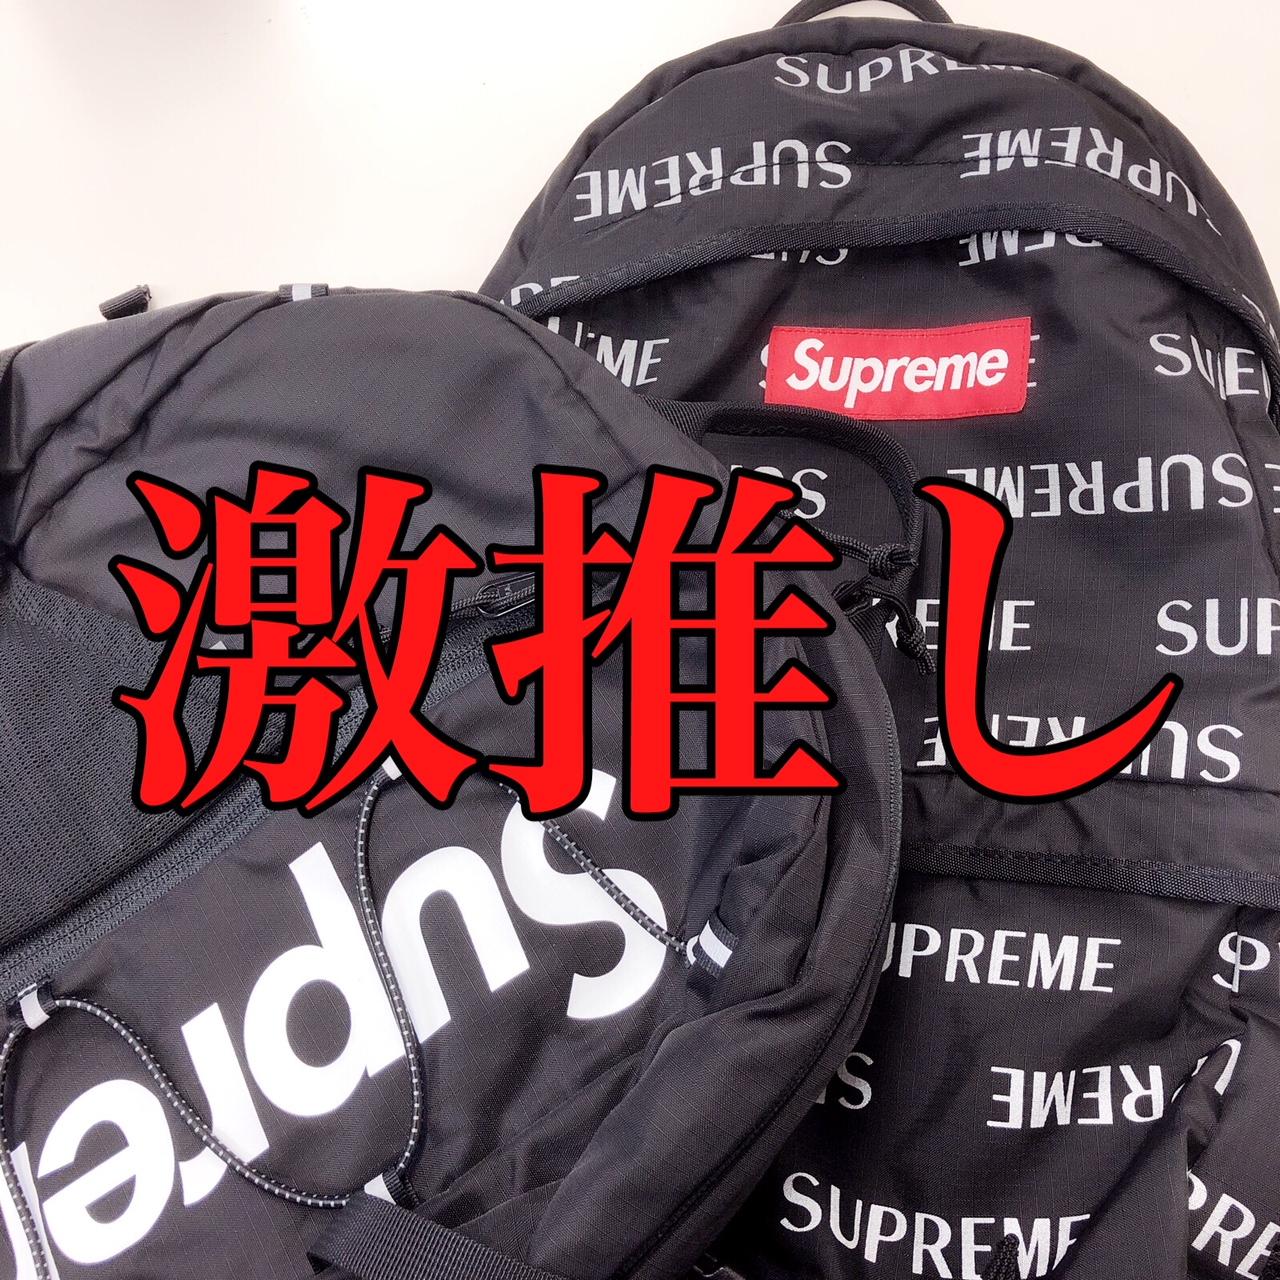 supreme supreme大阪 心斎橋 アメ村 シュプリーム THE NORTH FACE ニューエラ ノースフェイス 17AW 16AW backpack バックパック 中古 メメモリオンライン mememori online